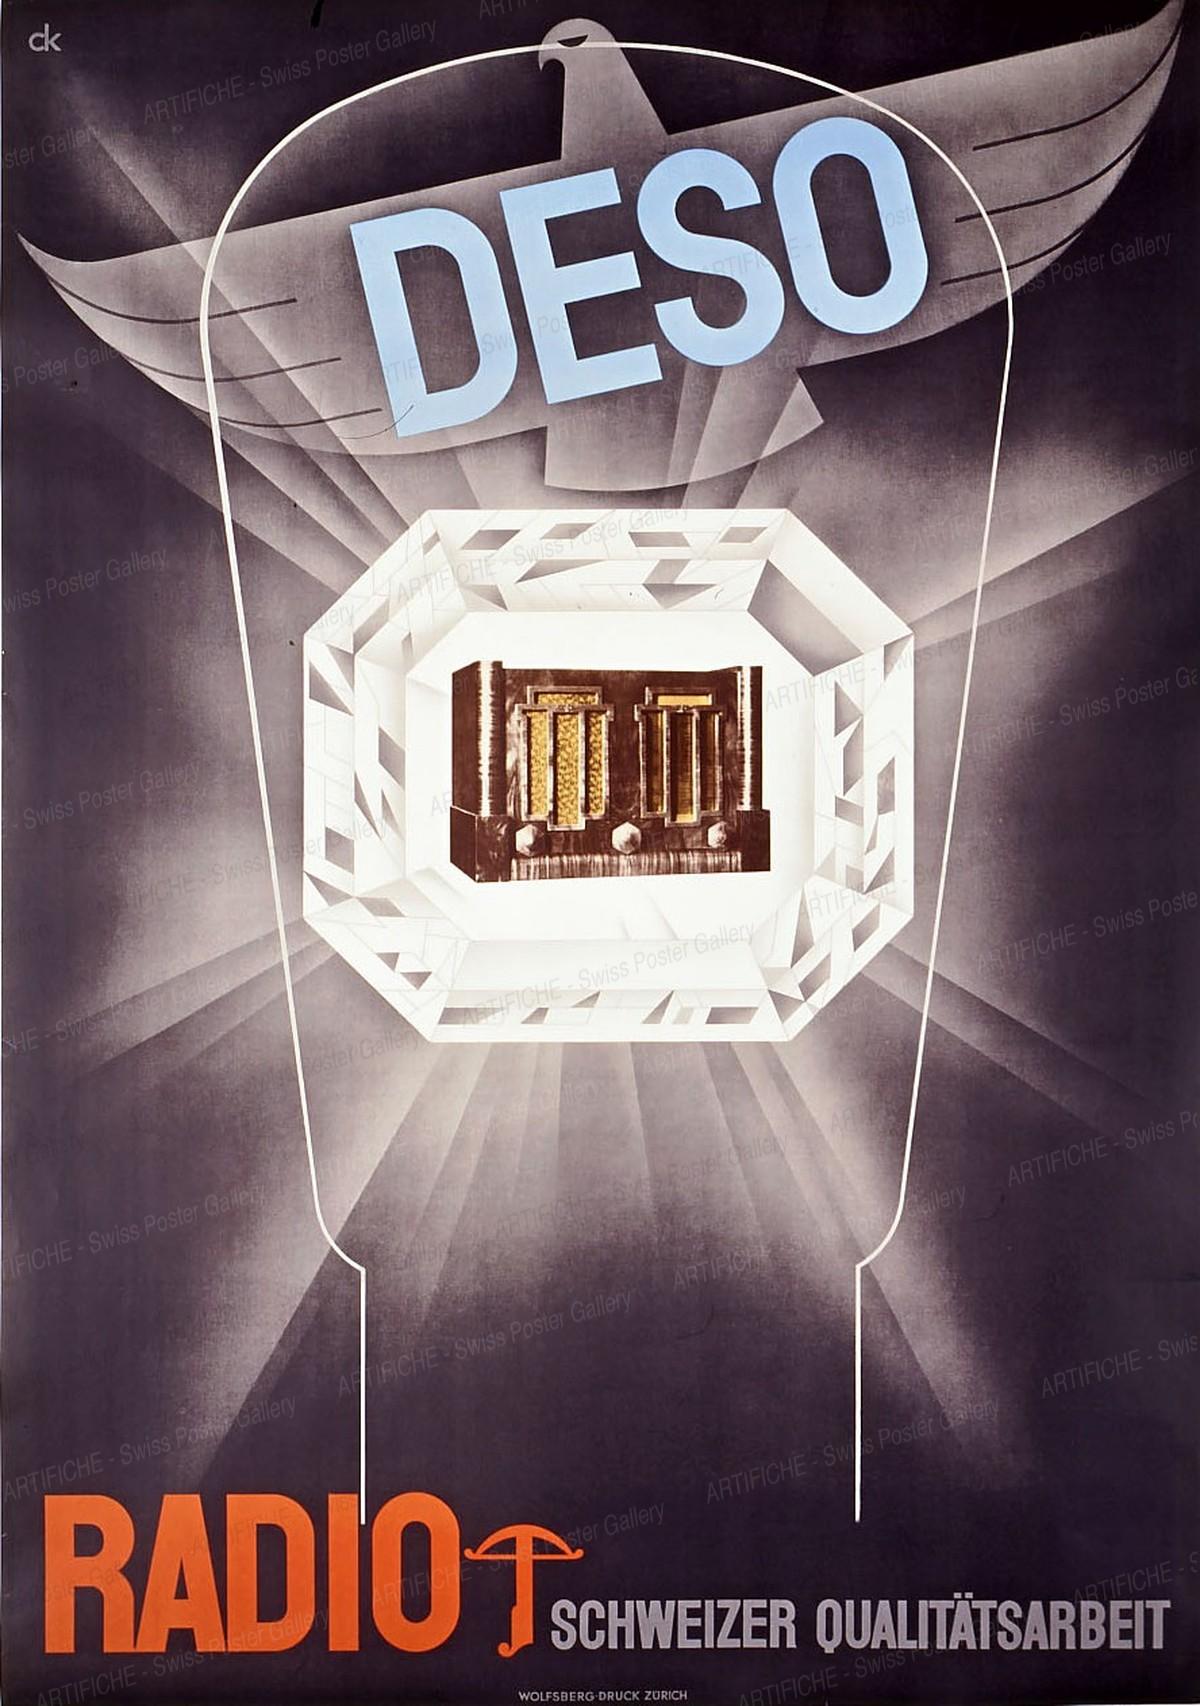 Radio Deso, Charles Kuhn